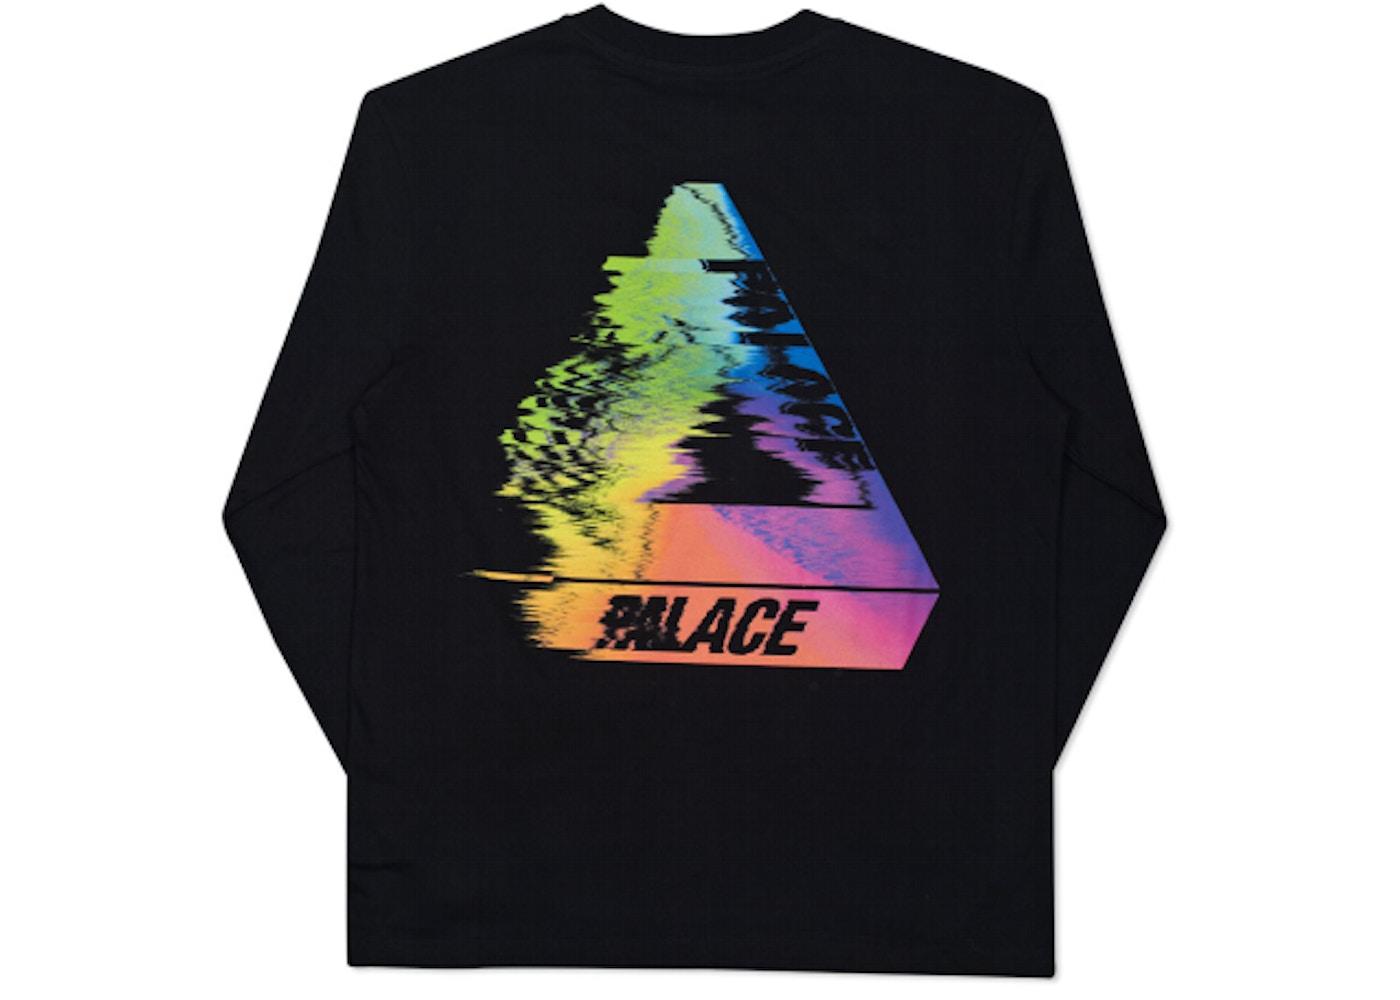 f67daa04 Palace Tri-Smudge L/S T-Shirt Black - Summer 2016